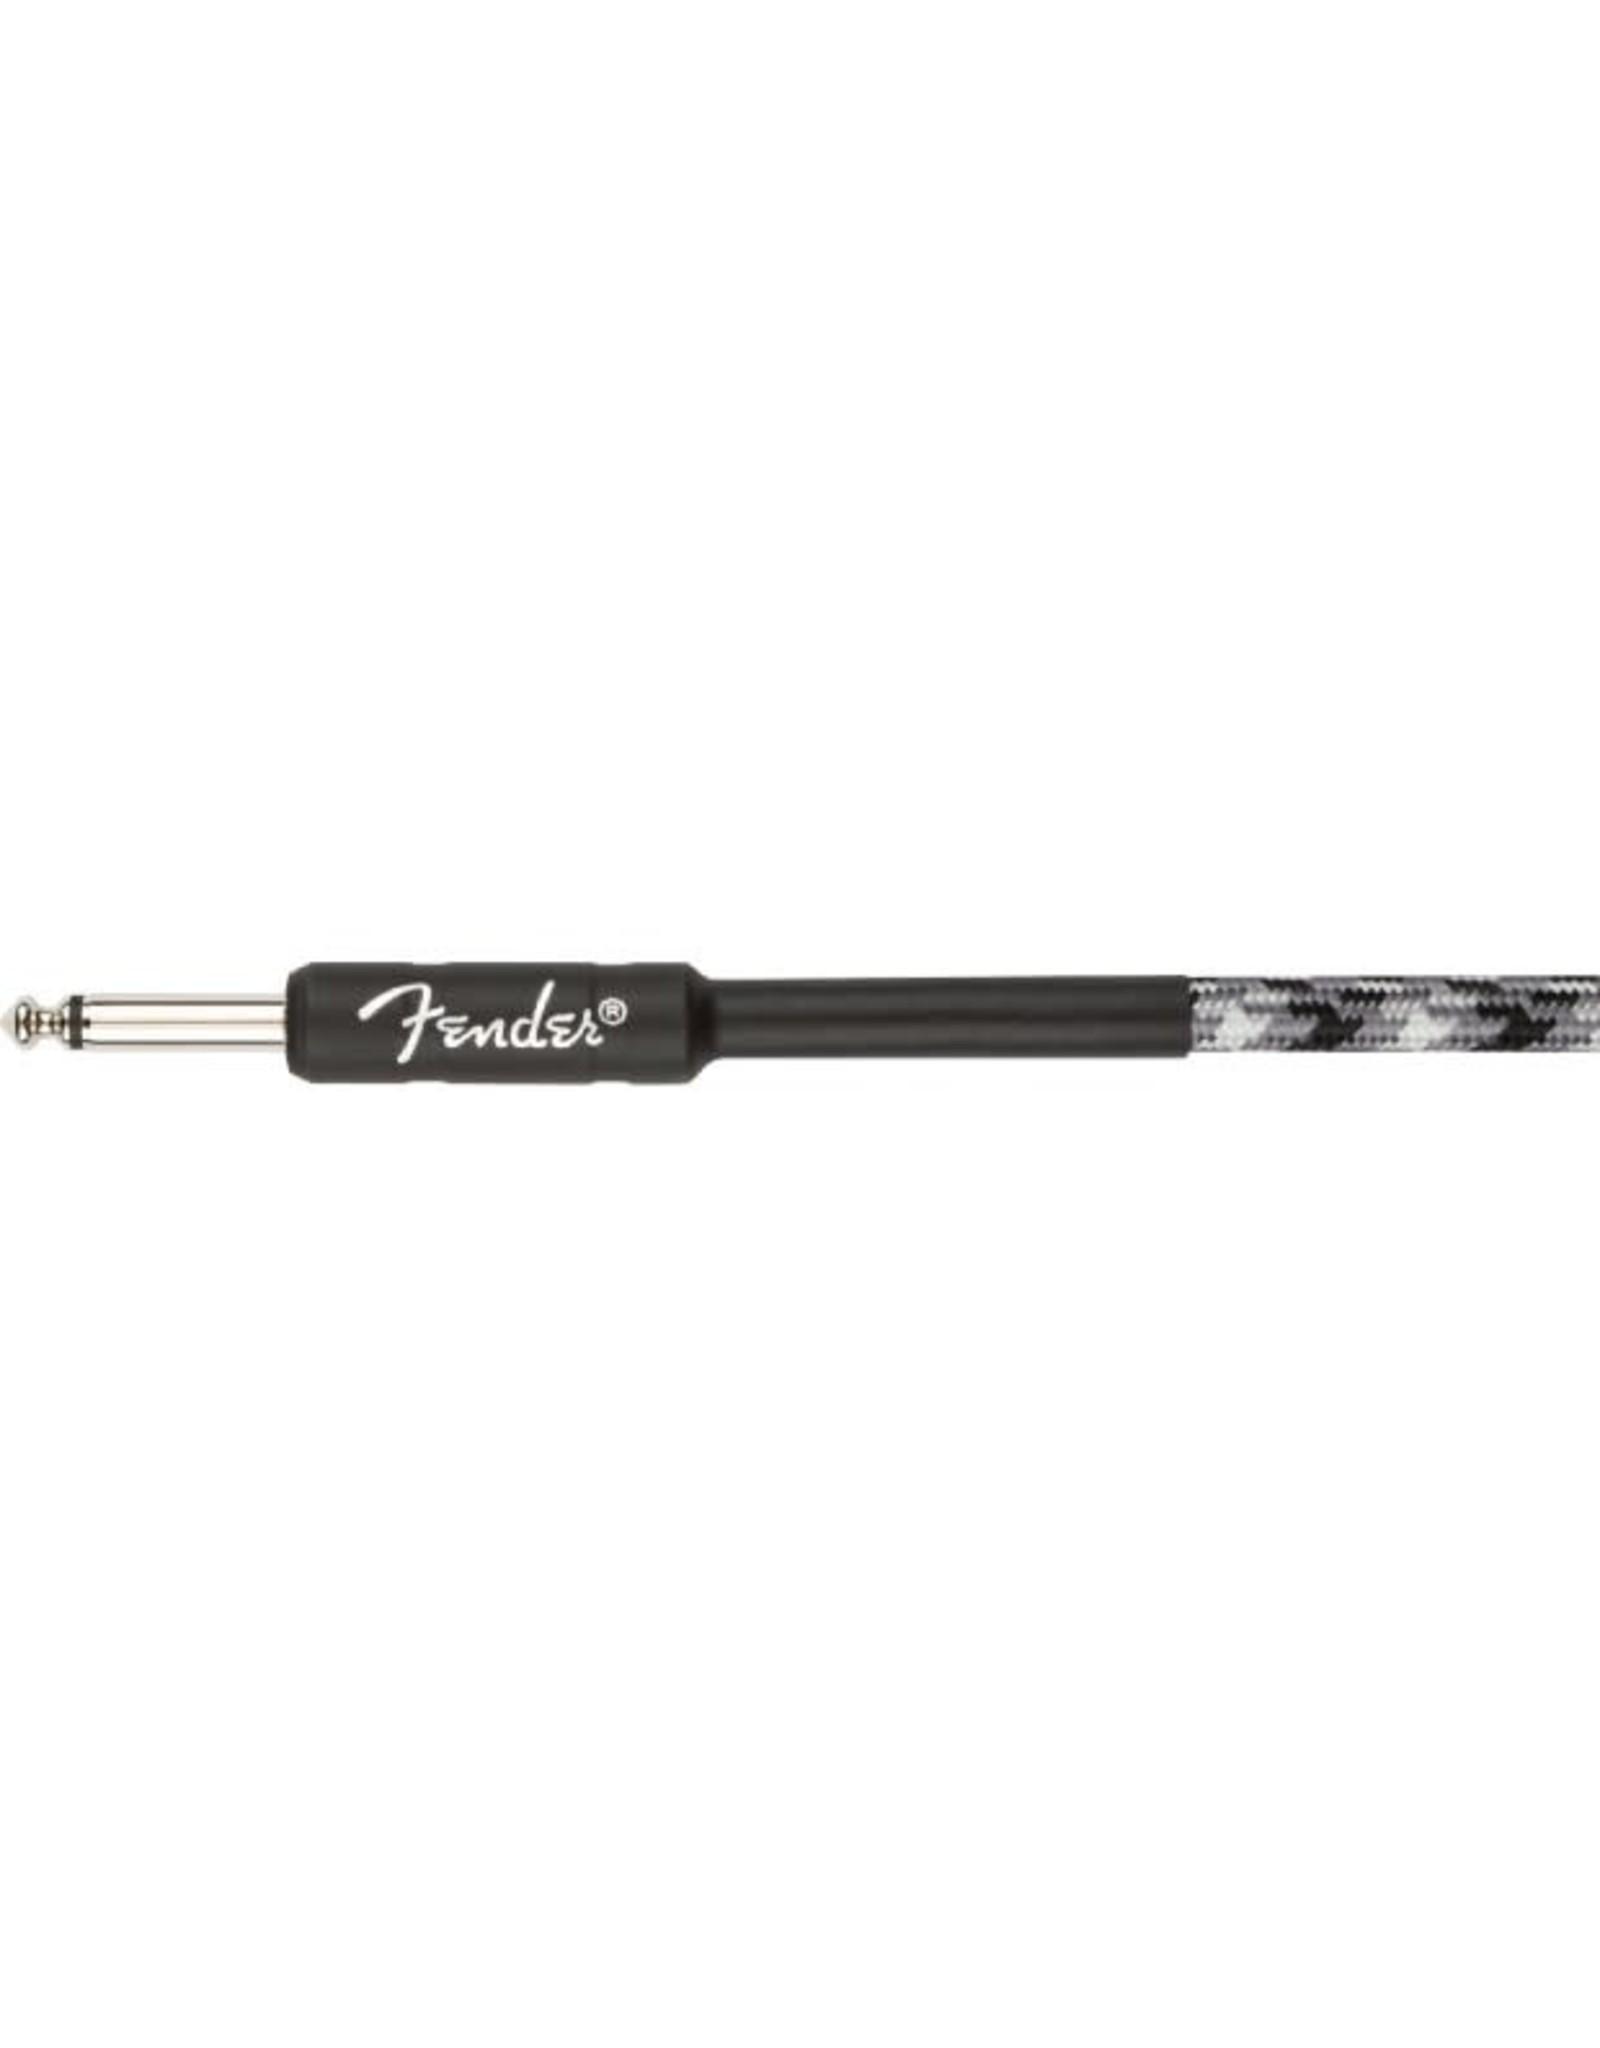 Fender Fender Pro Series Tweed Instrument Cable Winter Camo 10'